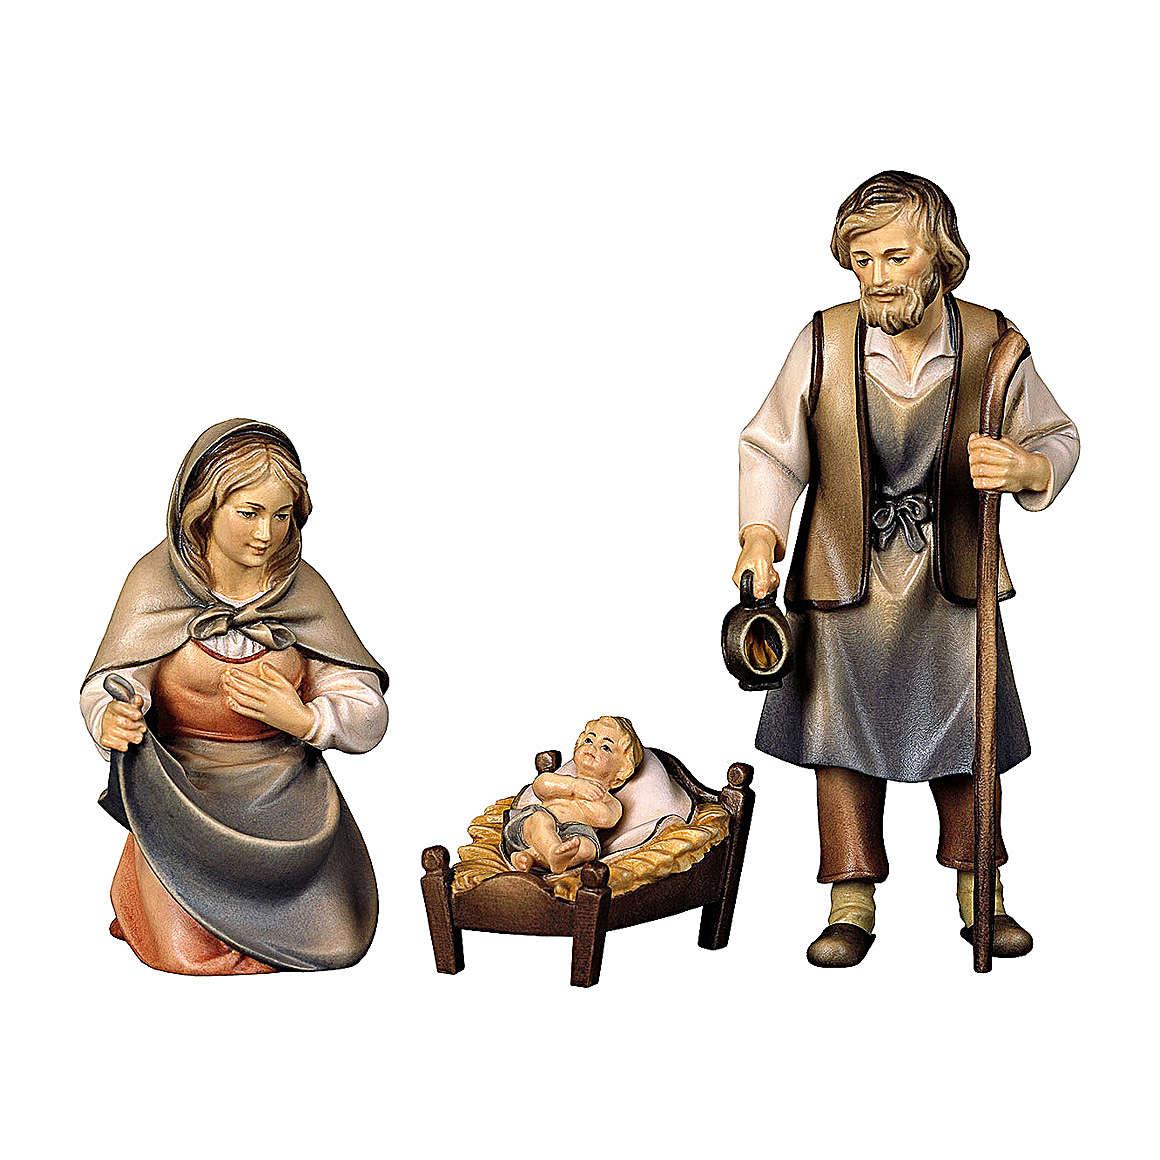 Sacra famiglia del presepe Original Pastore legno dipinto in Valgardena 10 cm 4